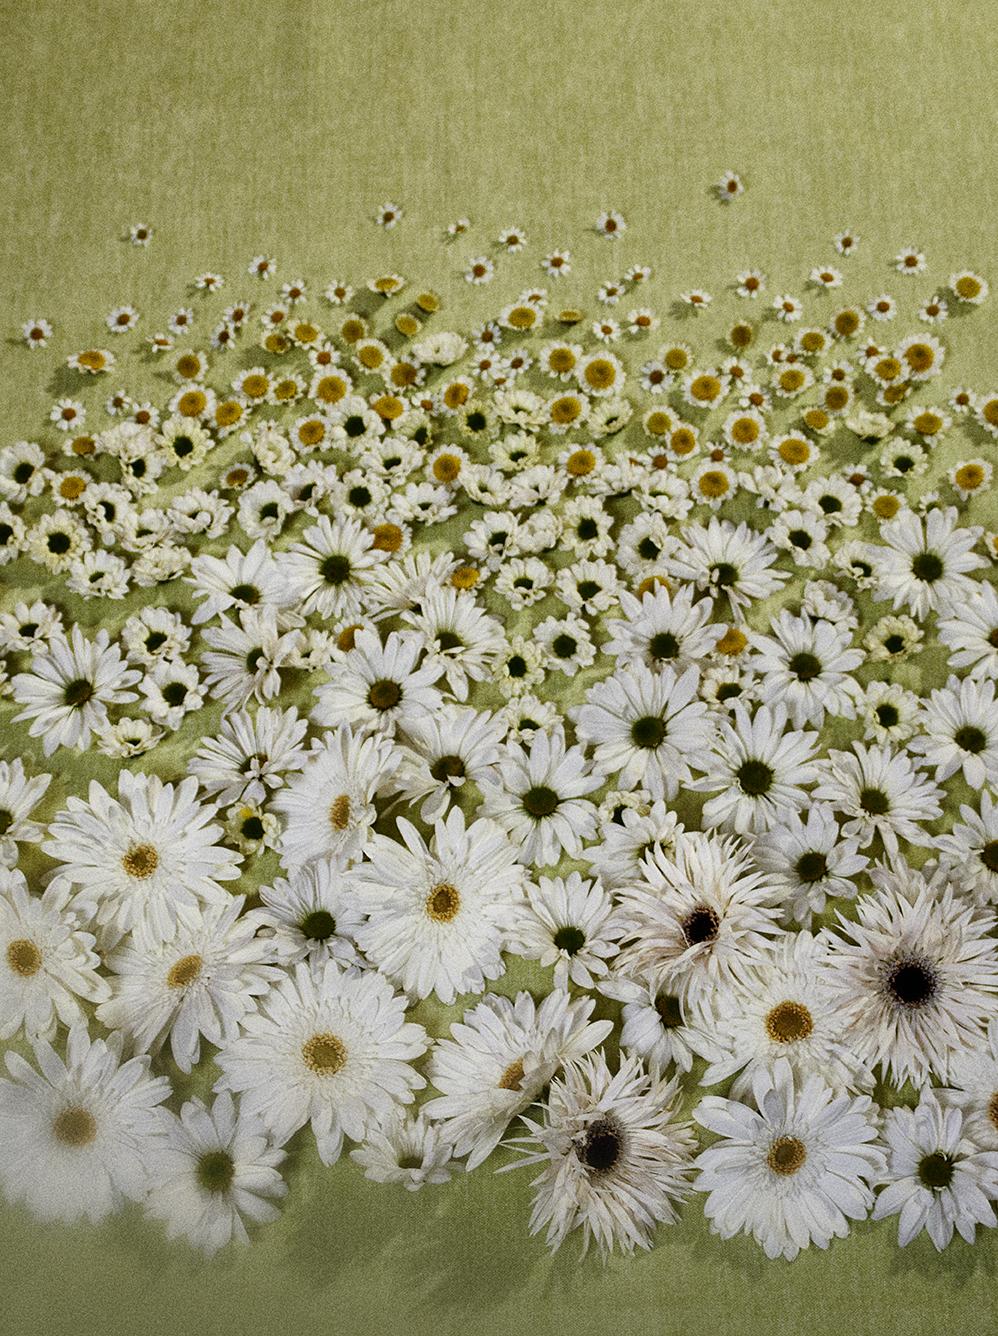 Tabletop Flowers-6225156-WA-1226-CMR.jpg